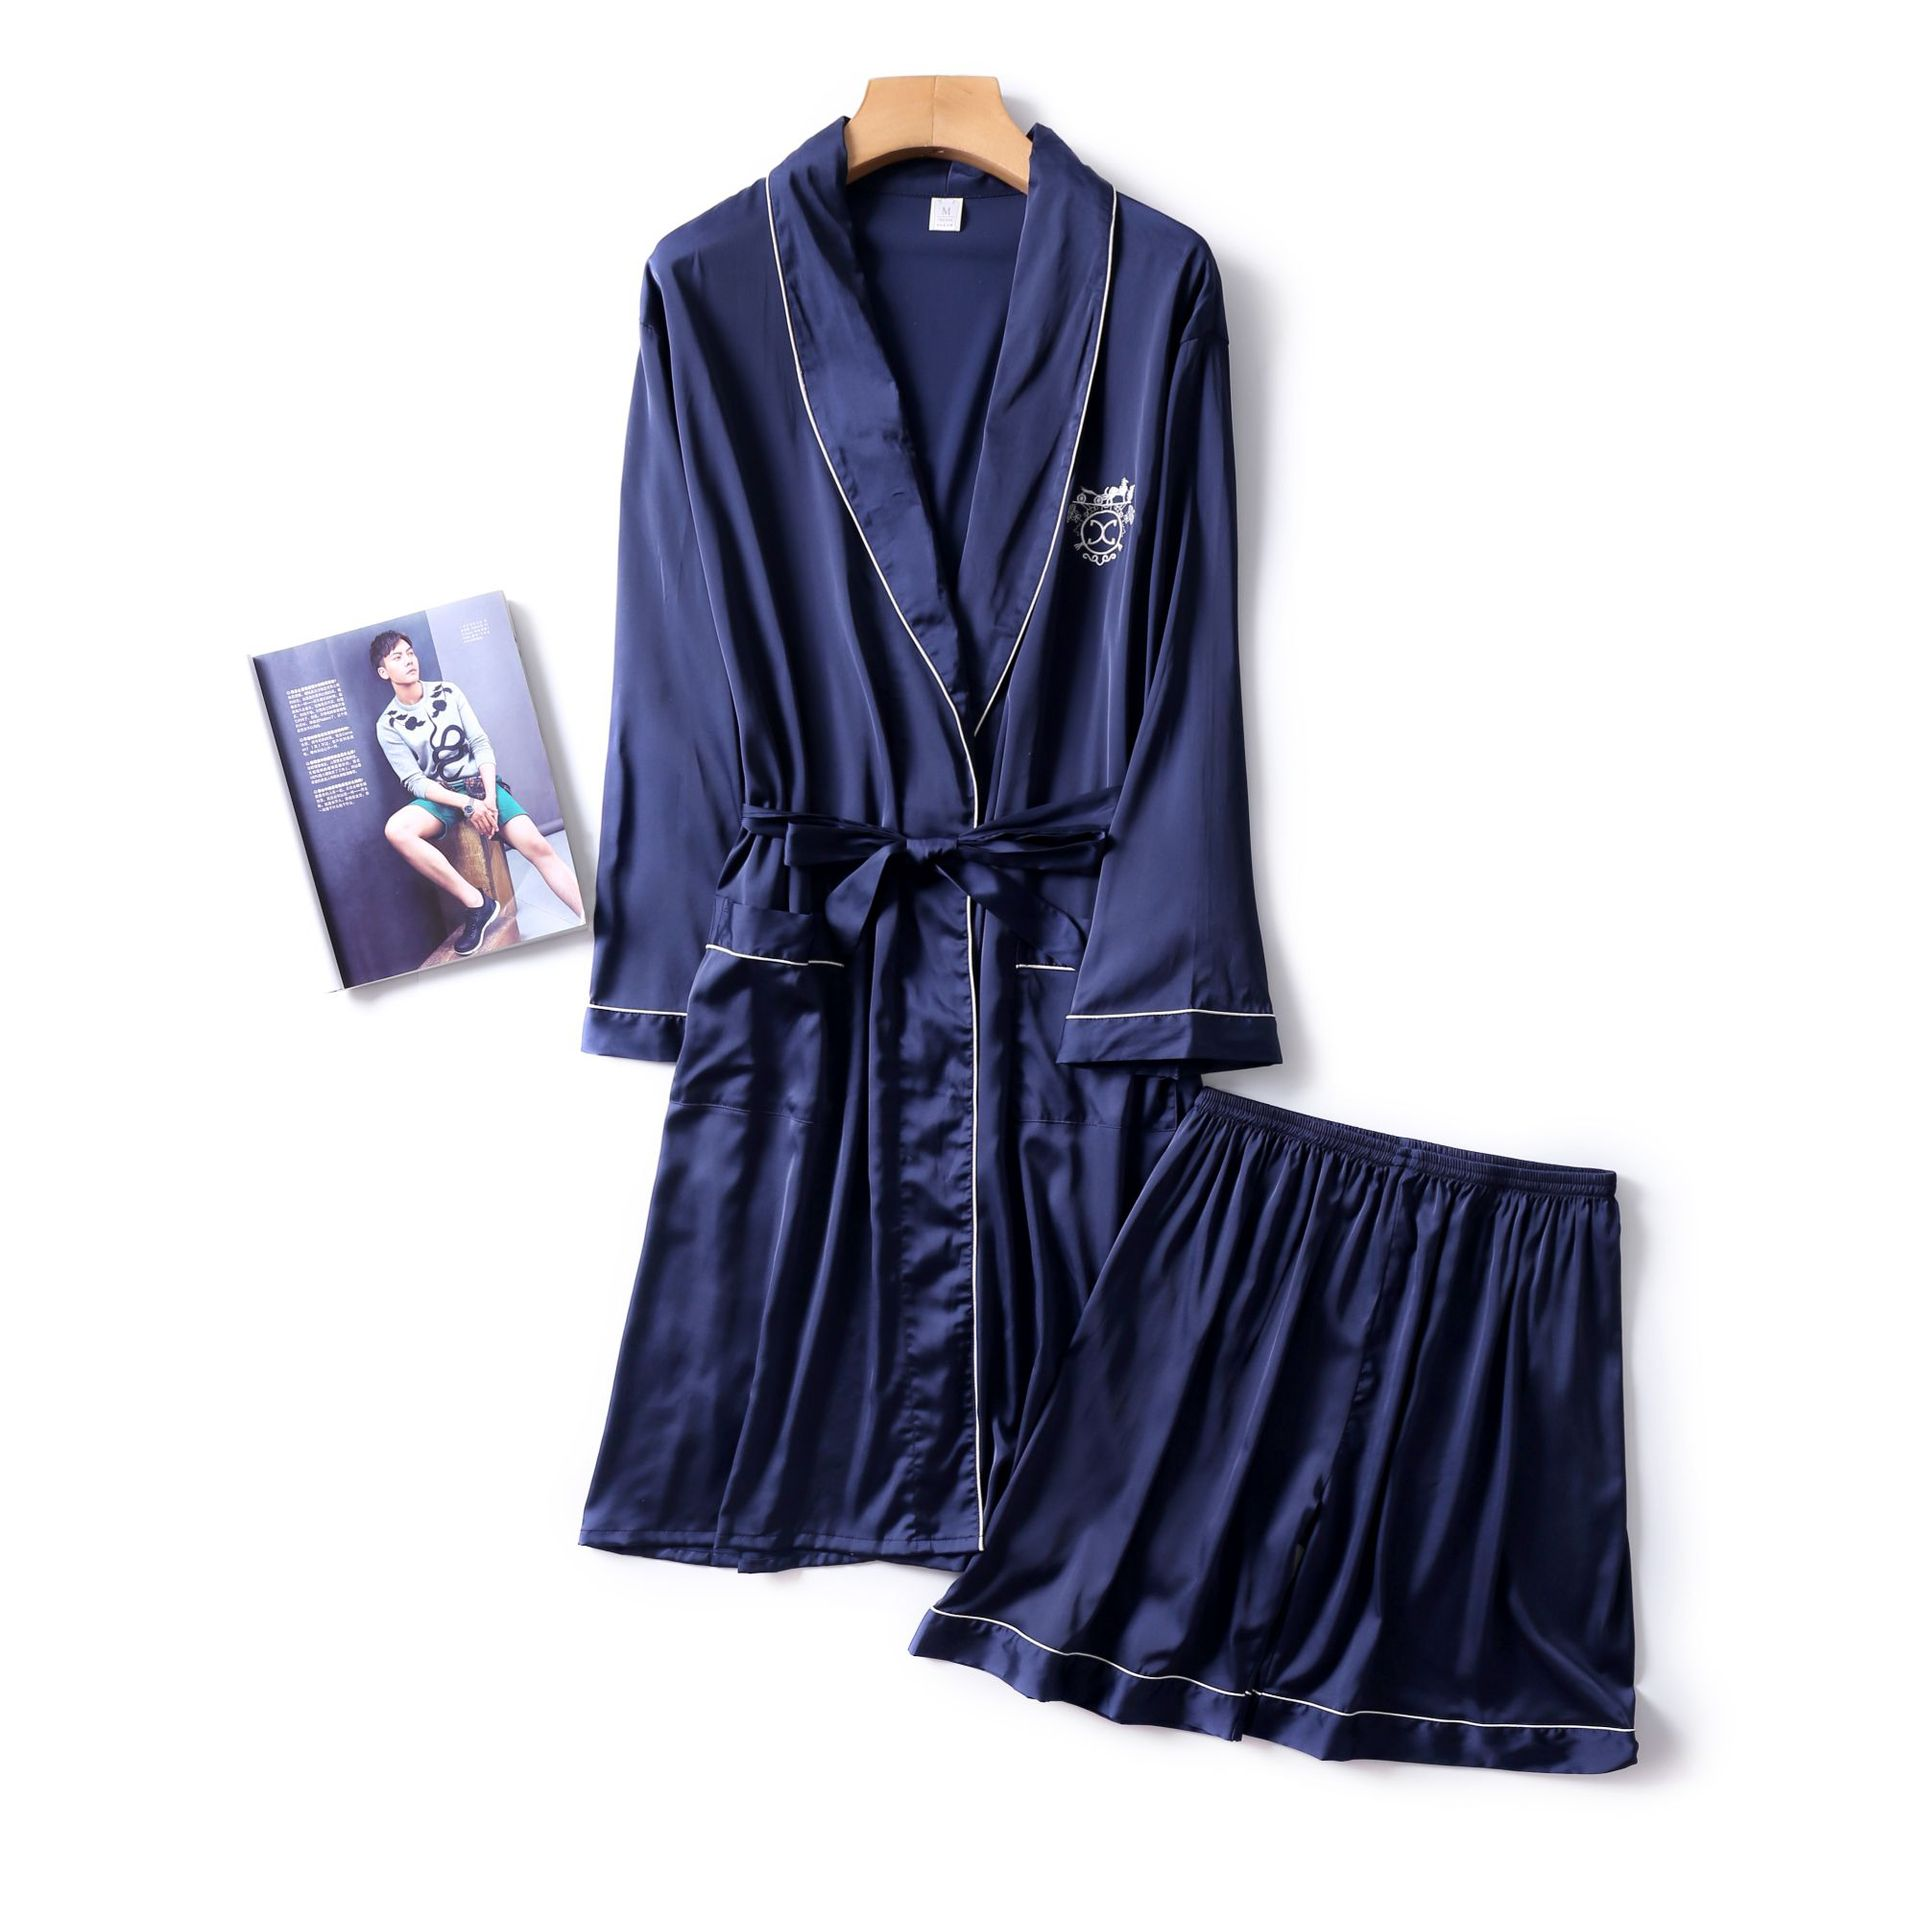 Navy Blue Mens Robe Short Pants Pajamas Suit Spring Two Piece Sleepwear Sets Casual Home Wear Nightwear Sleep Kimono Bath Gown